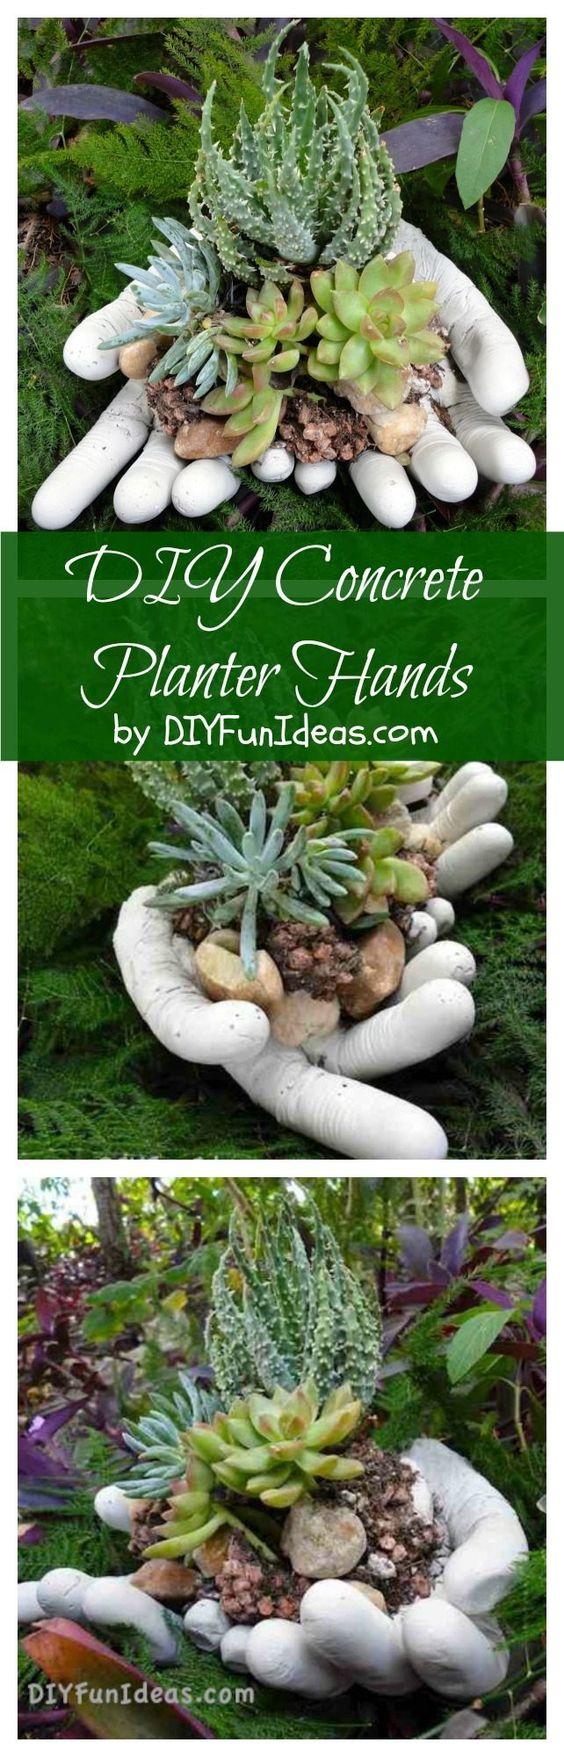 DIY Concrete Hand Planters.